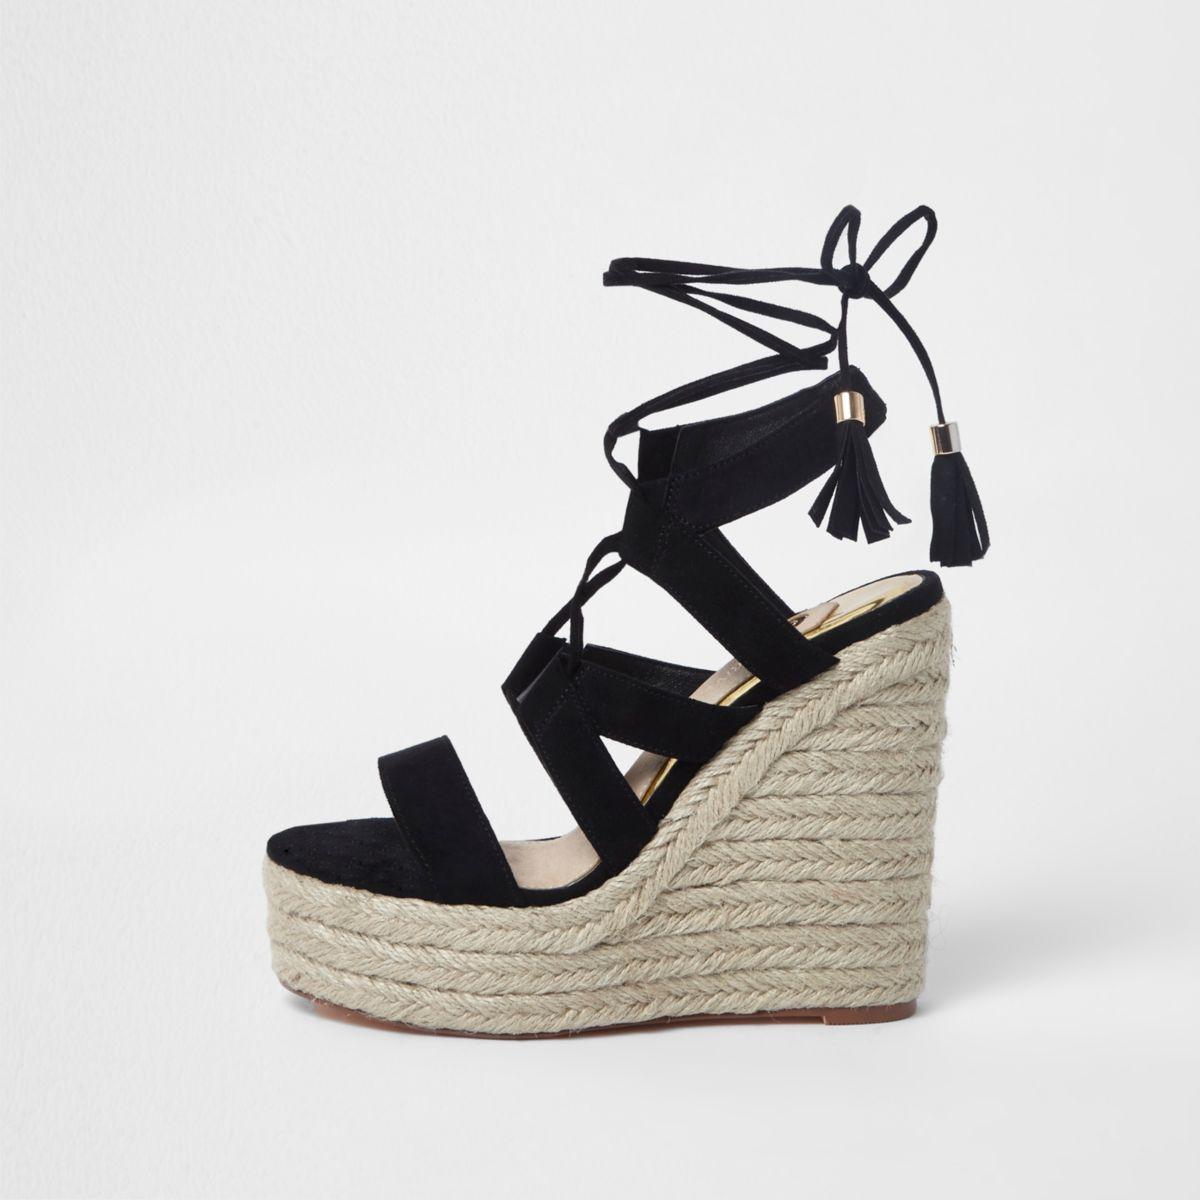 River Island Wedge Sandals